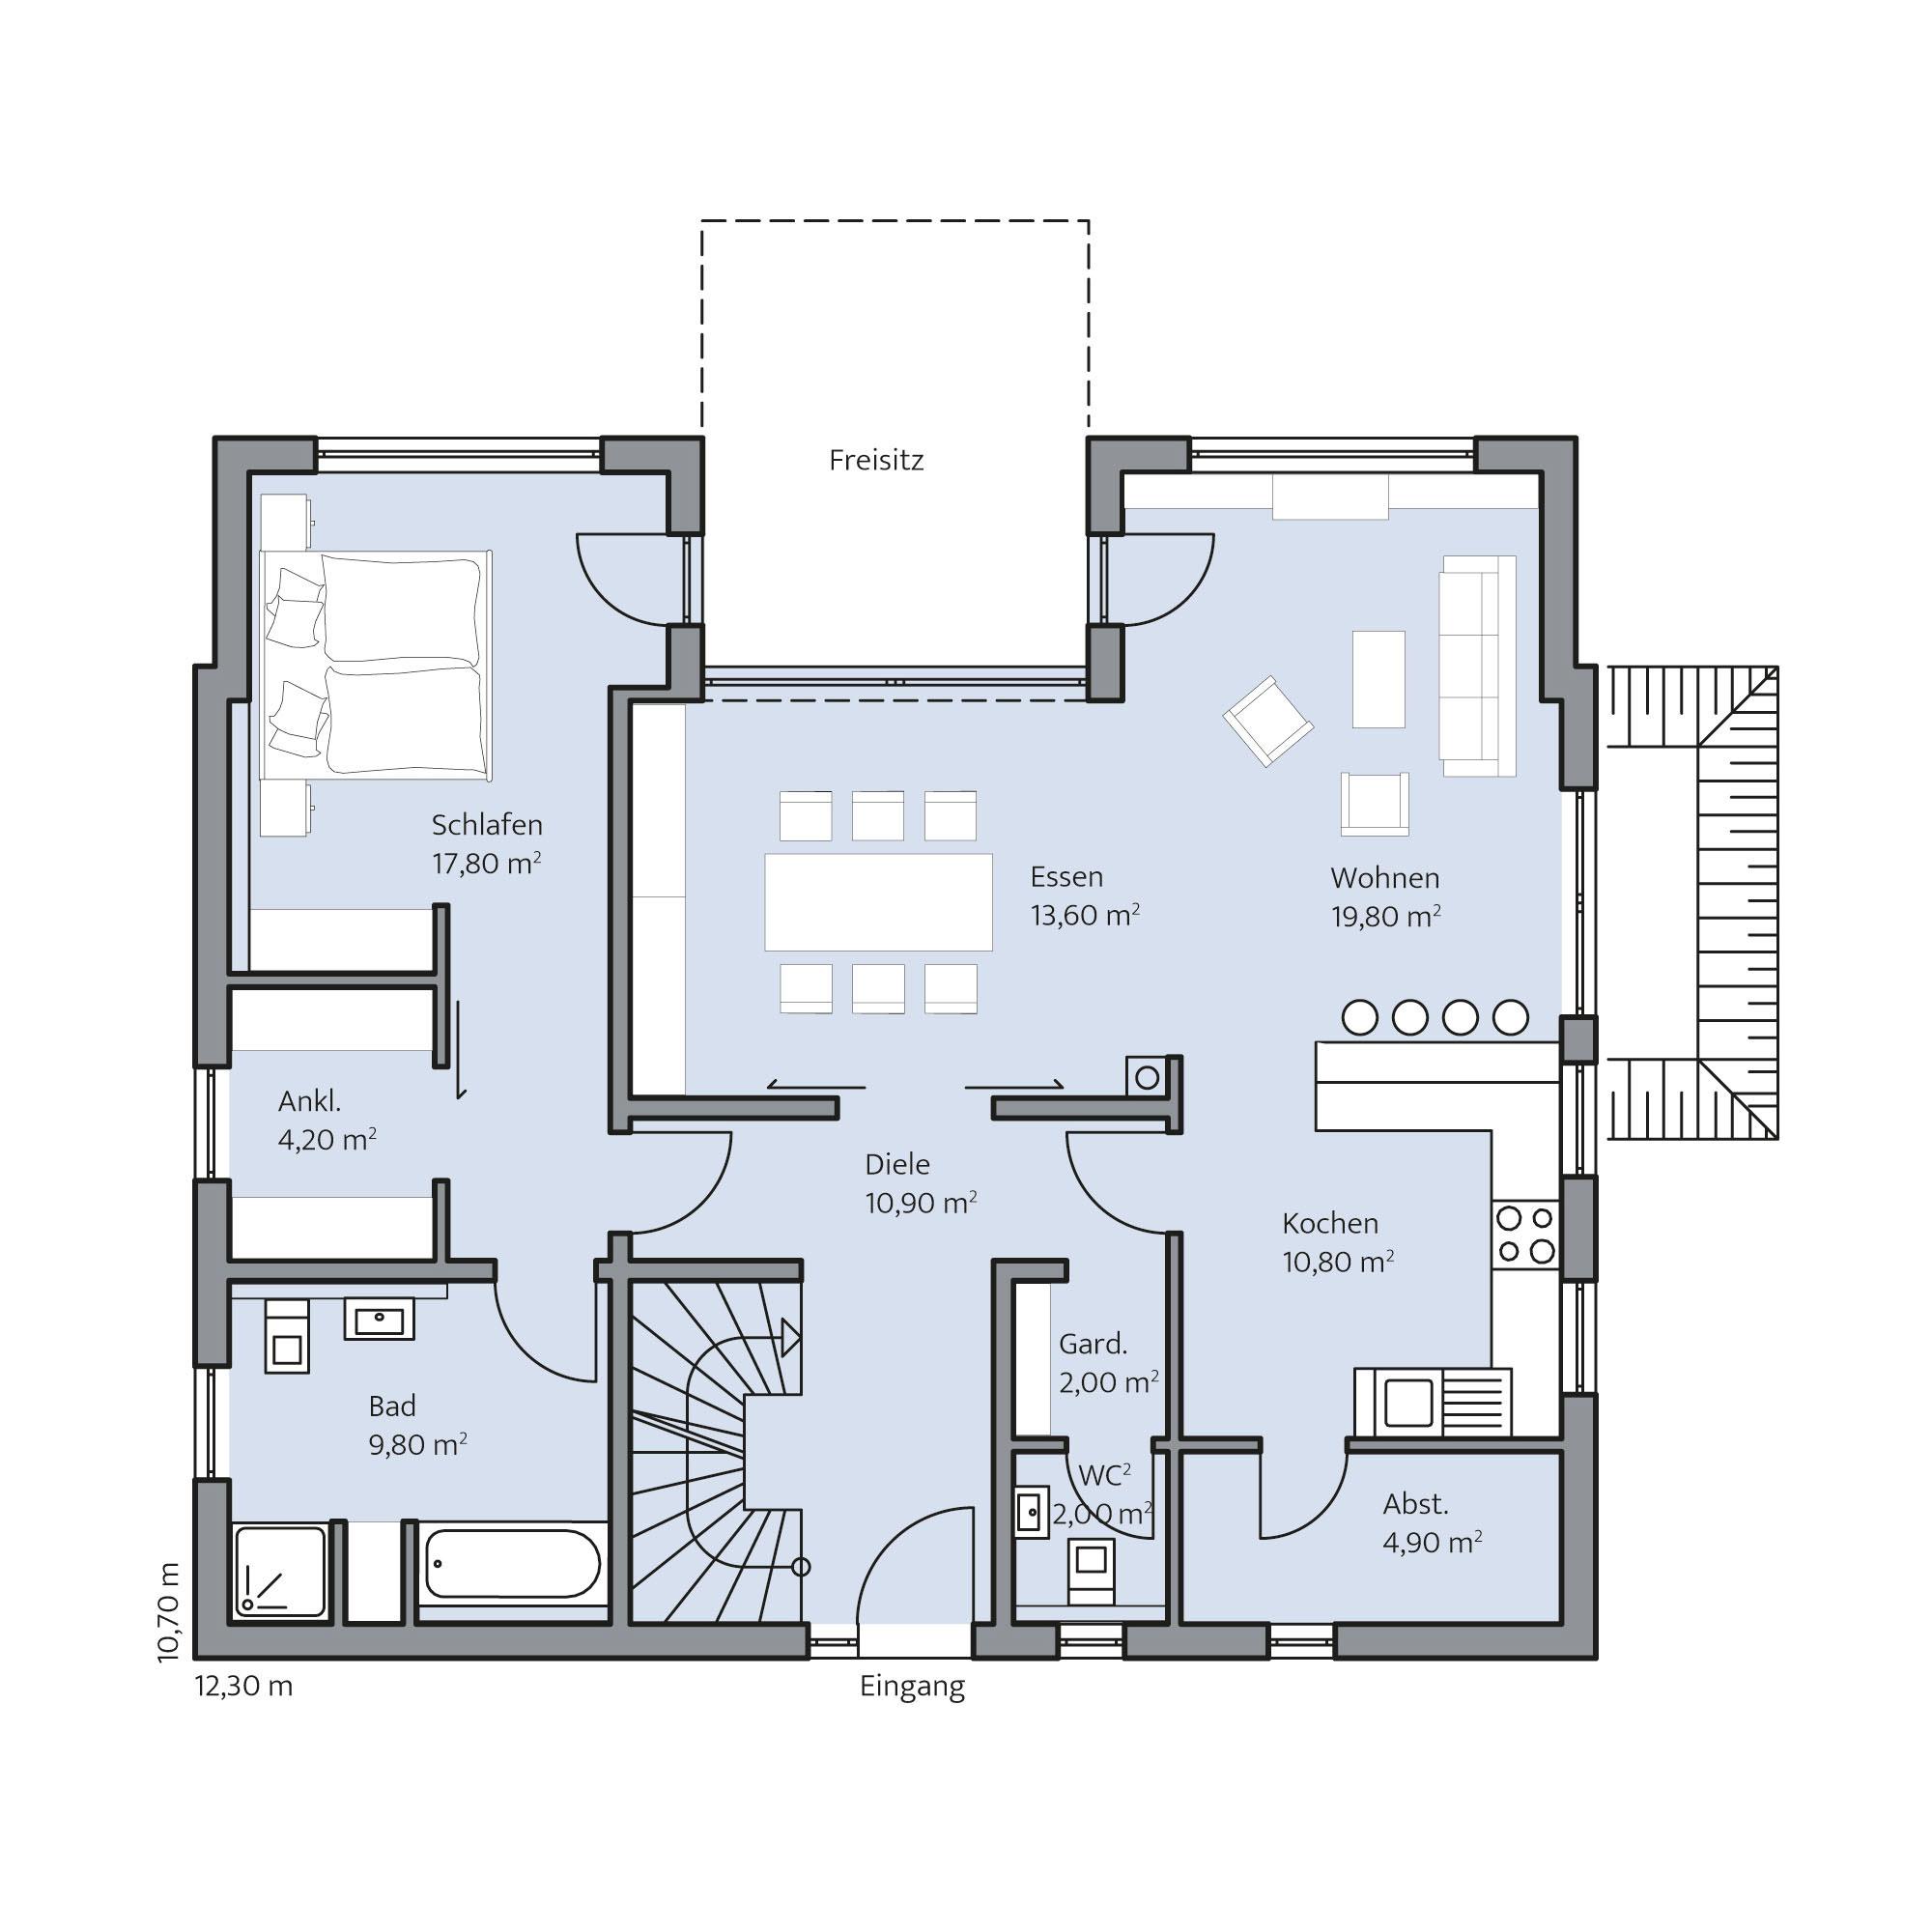 Haus Rothe - Oberbremer Baubetriebe Bünde